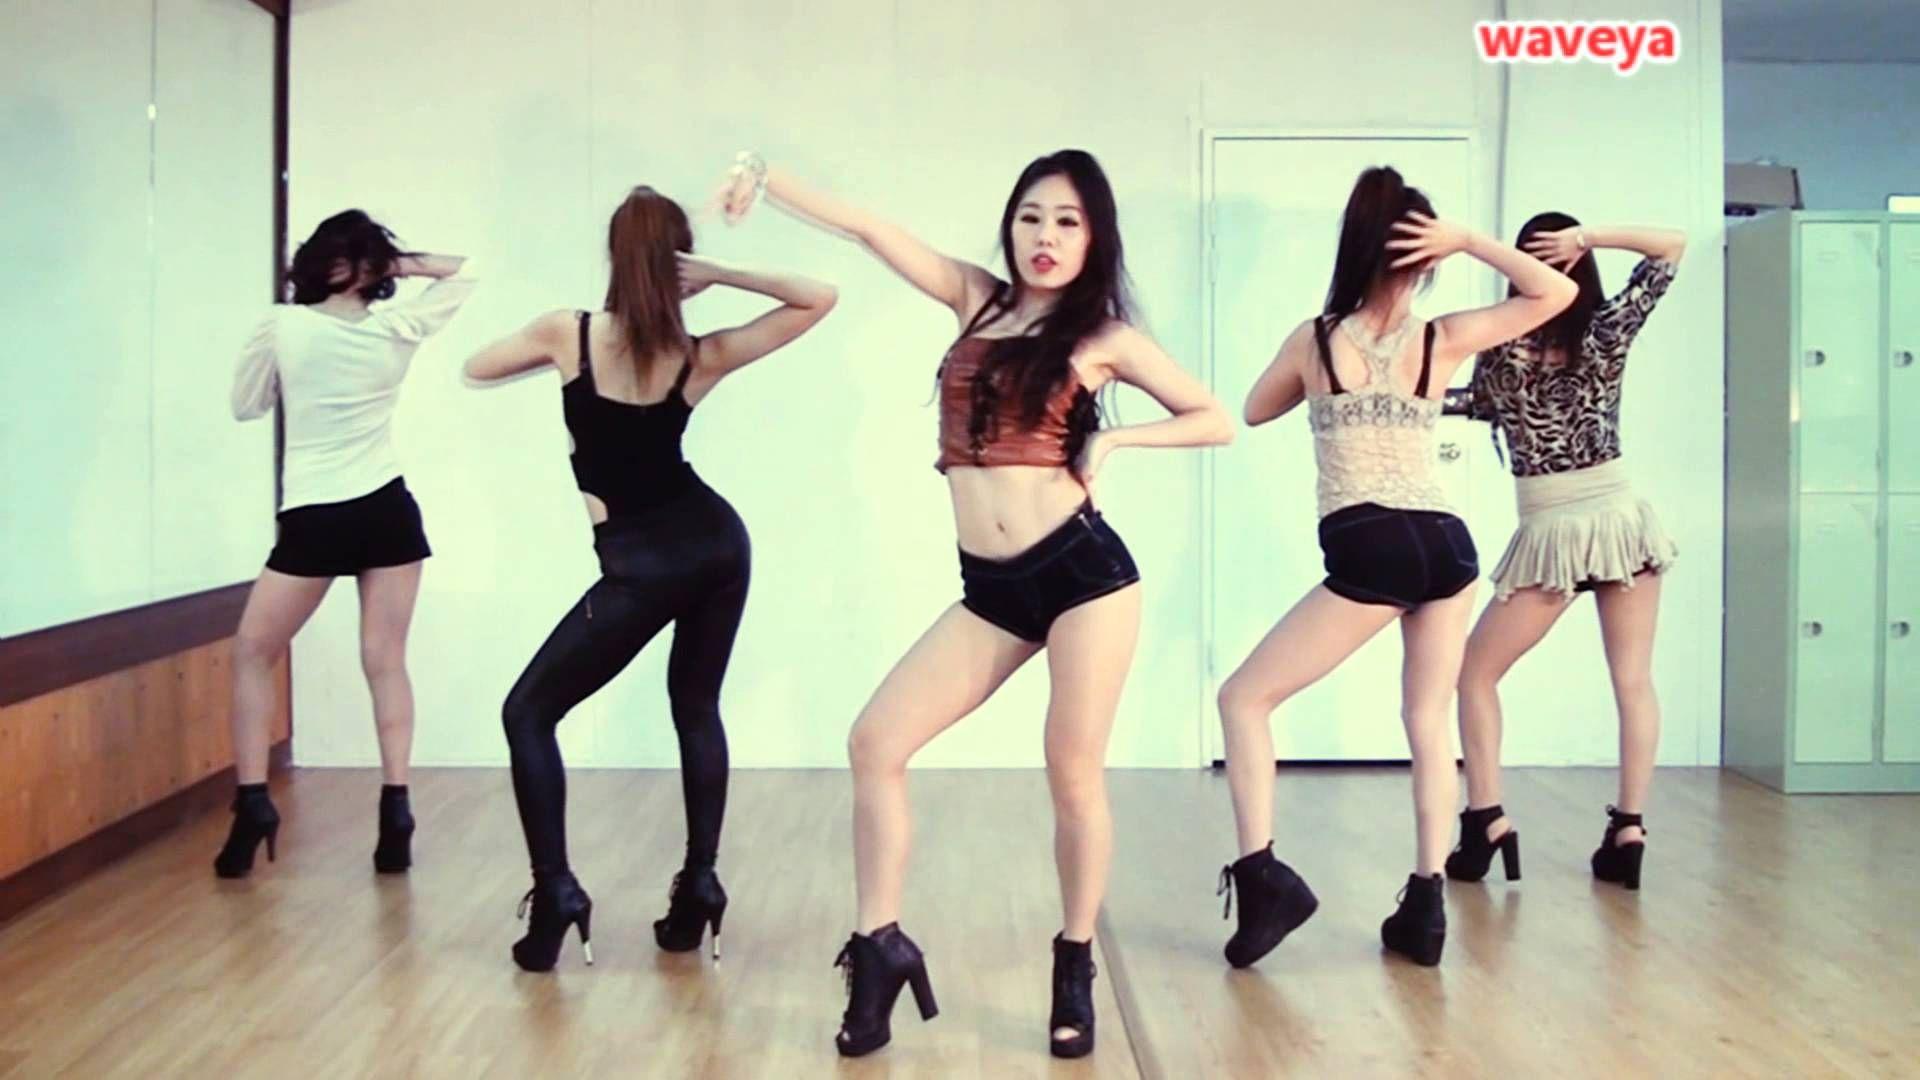 Waveya cover dance exid - 5 8